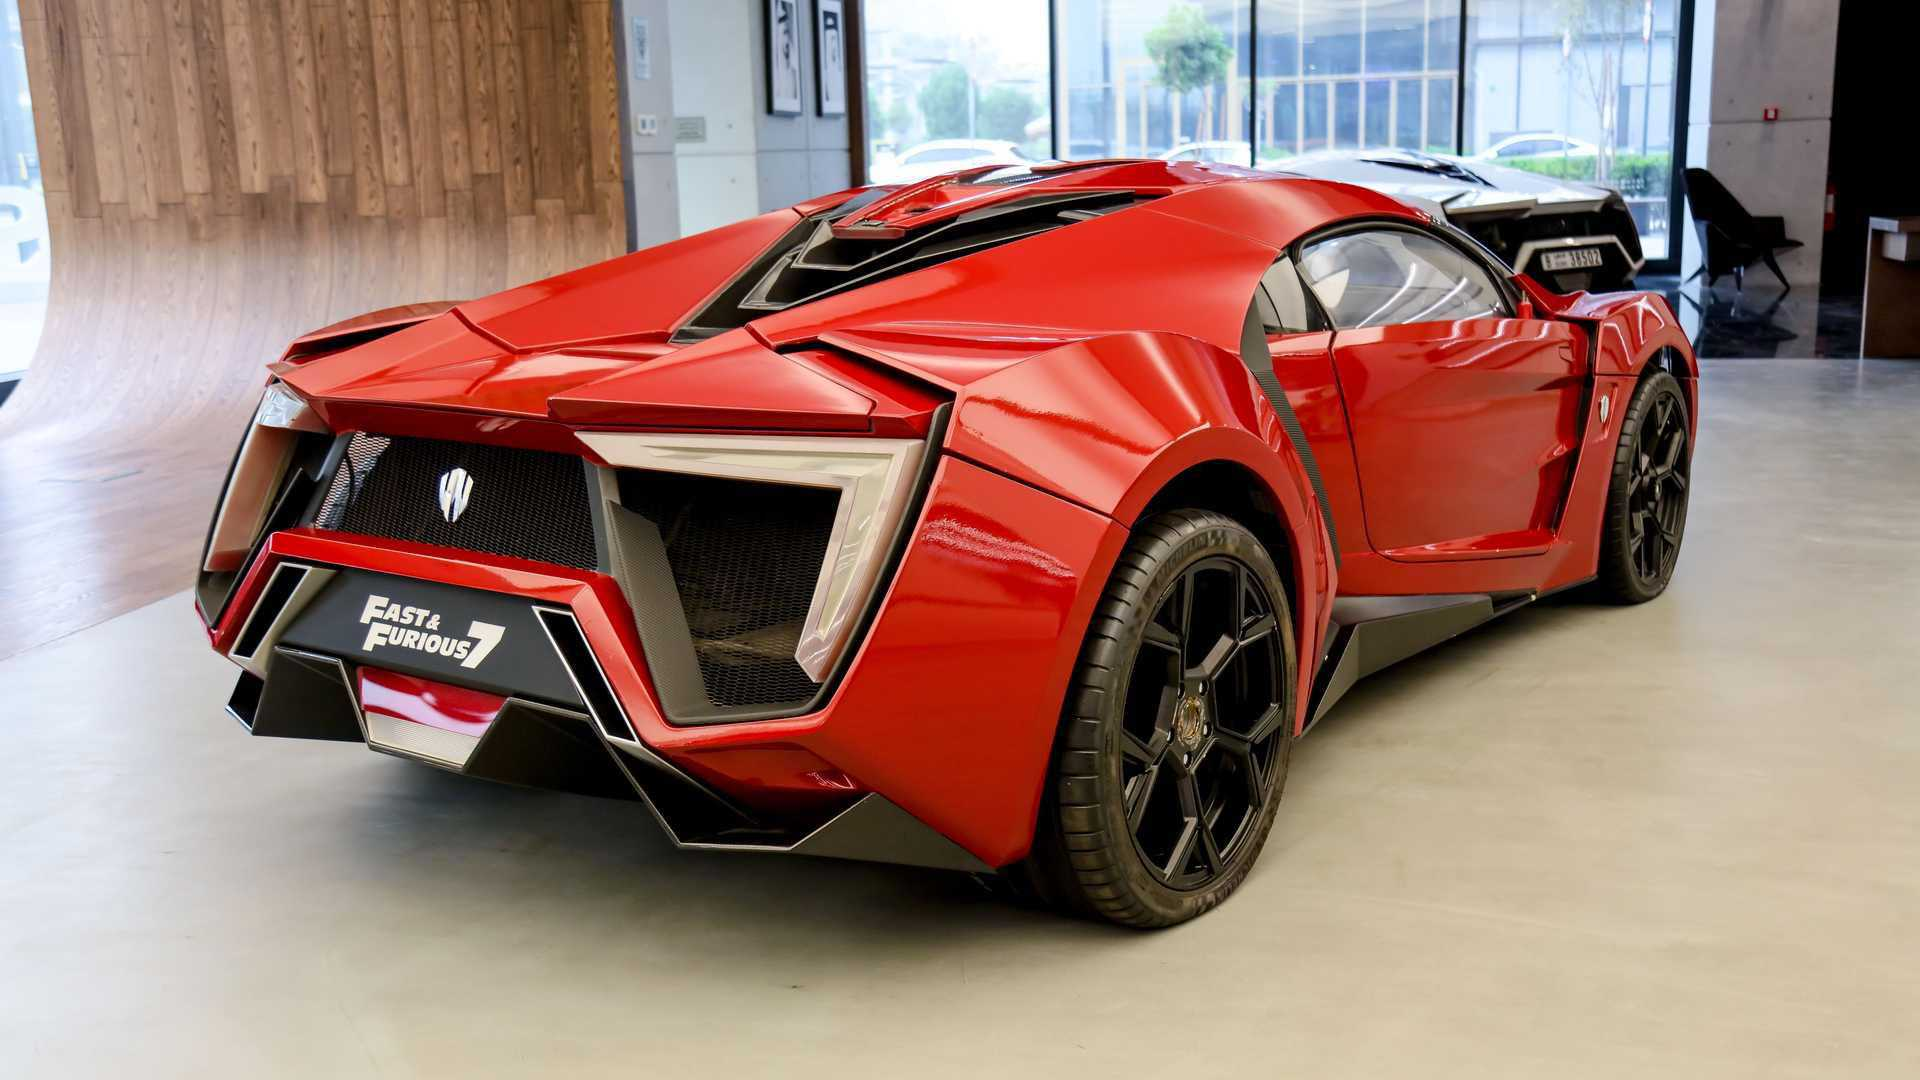 Lykan_HyperSport_stunt_car_sale-0006